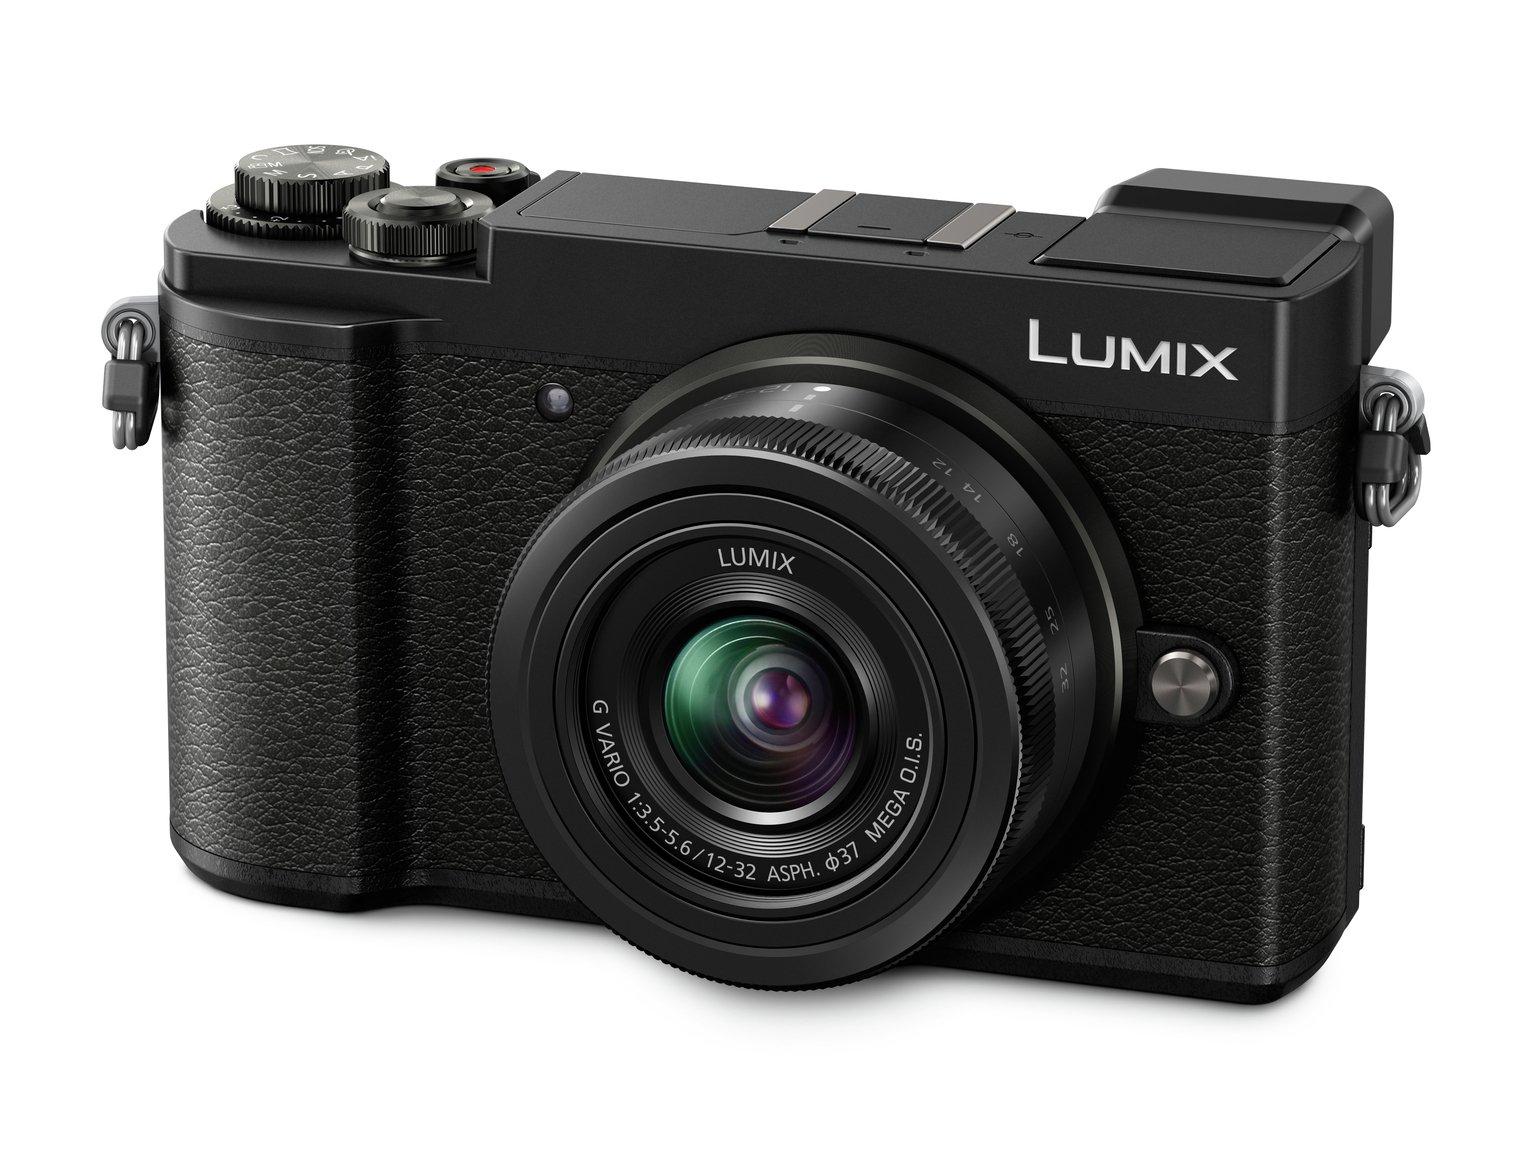 Panasonic LUMIX DC-GX9KEB-K Compact System Mirrorless Camera with 12-32 mm Lens - Black